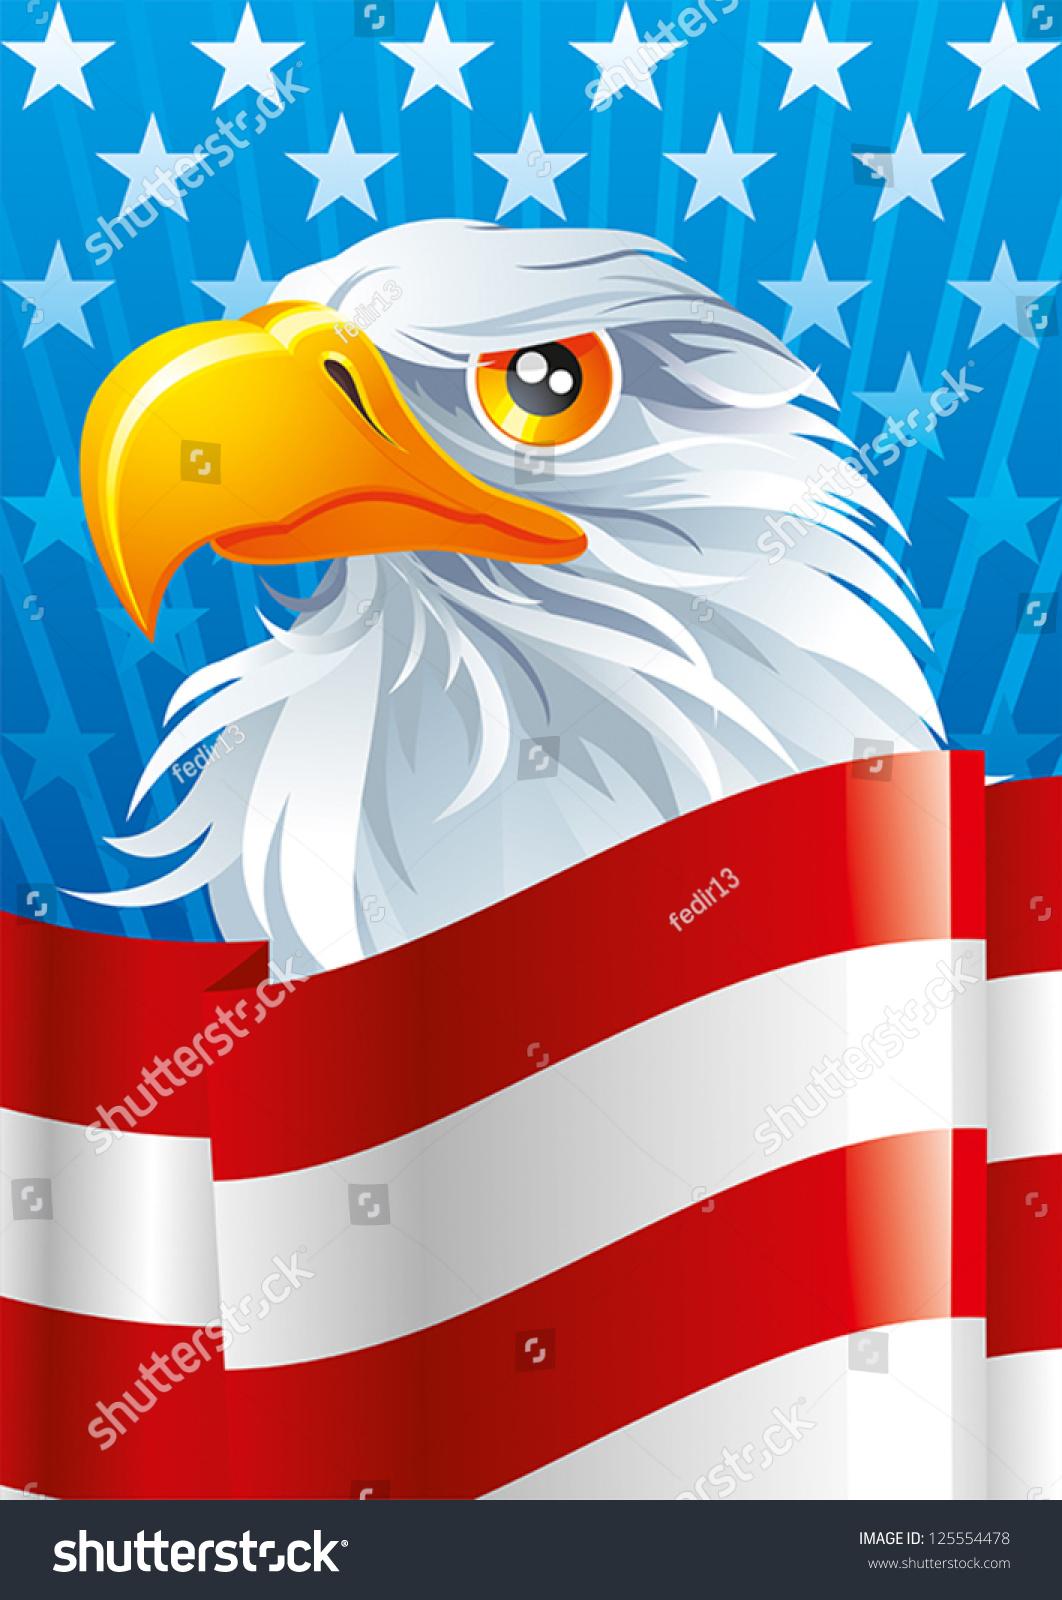 National Symbol Usa Stock Vector Royalty Free 125554478 Shutterstock